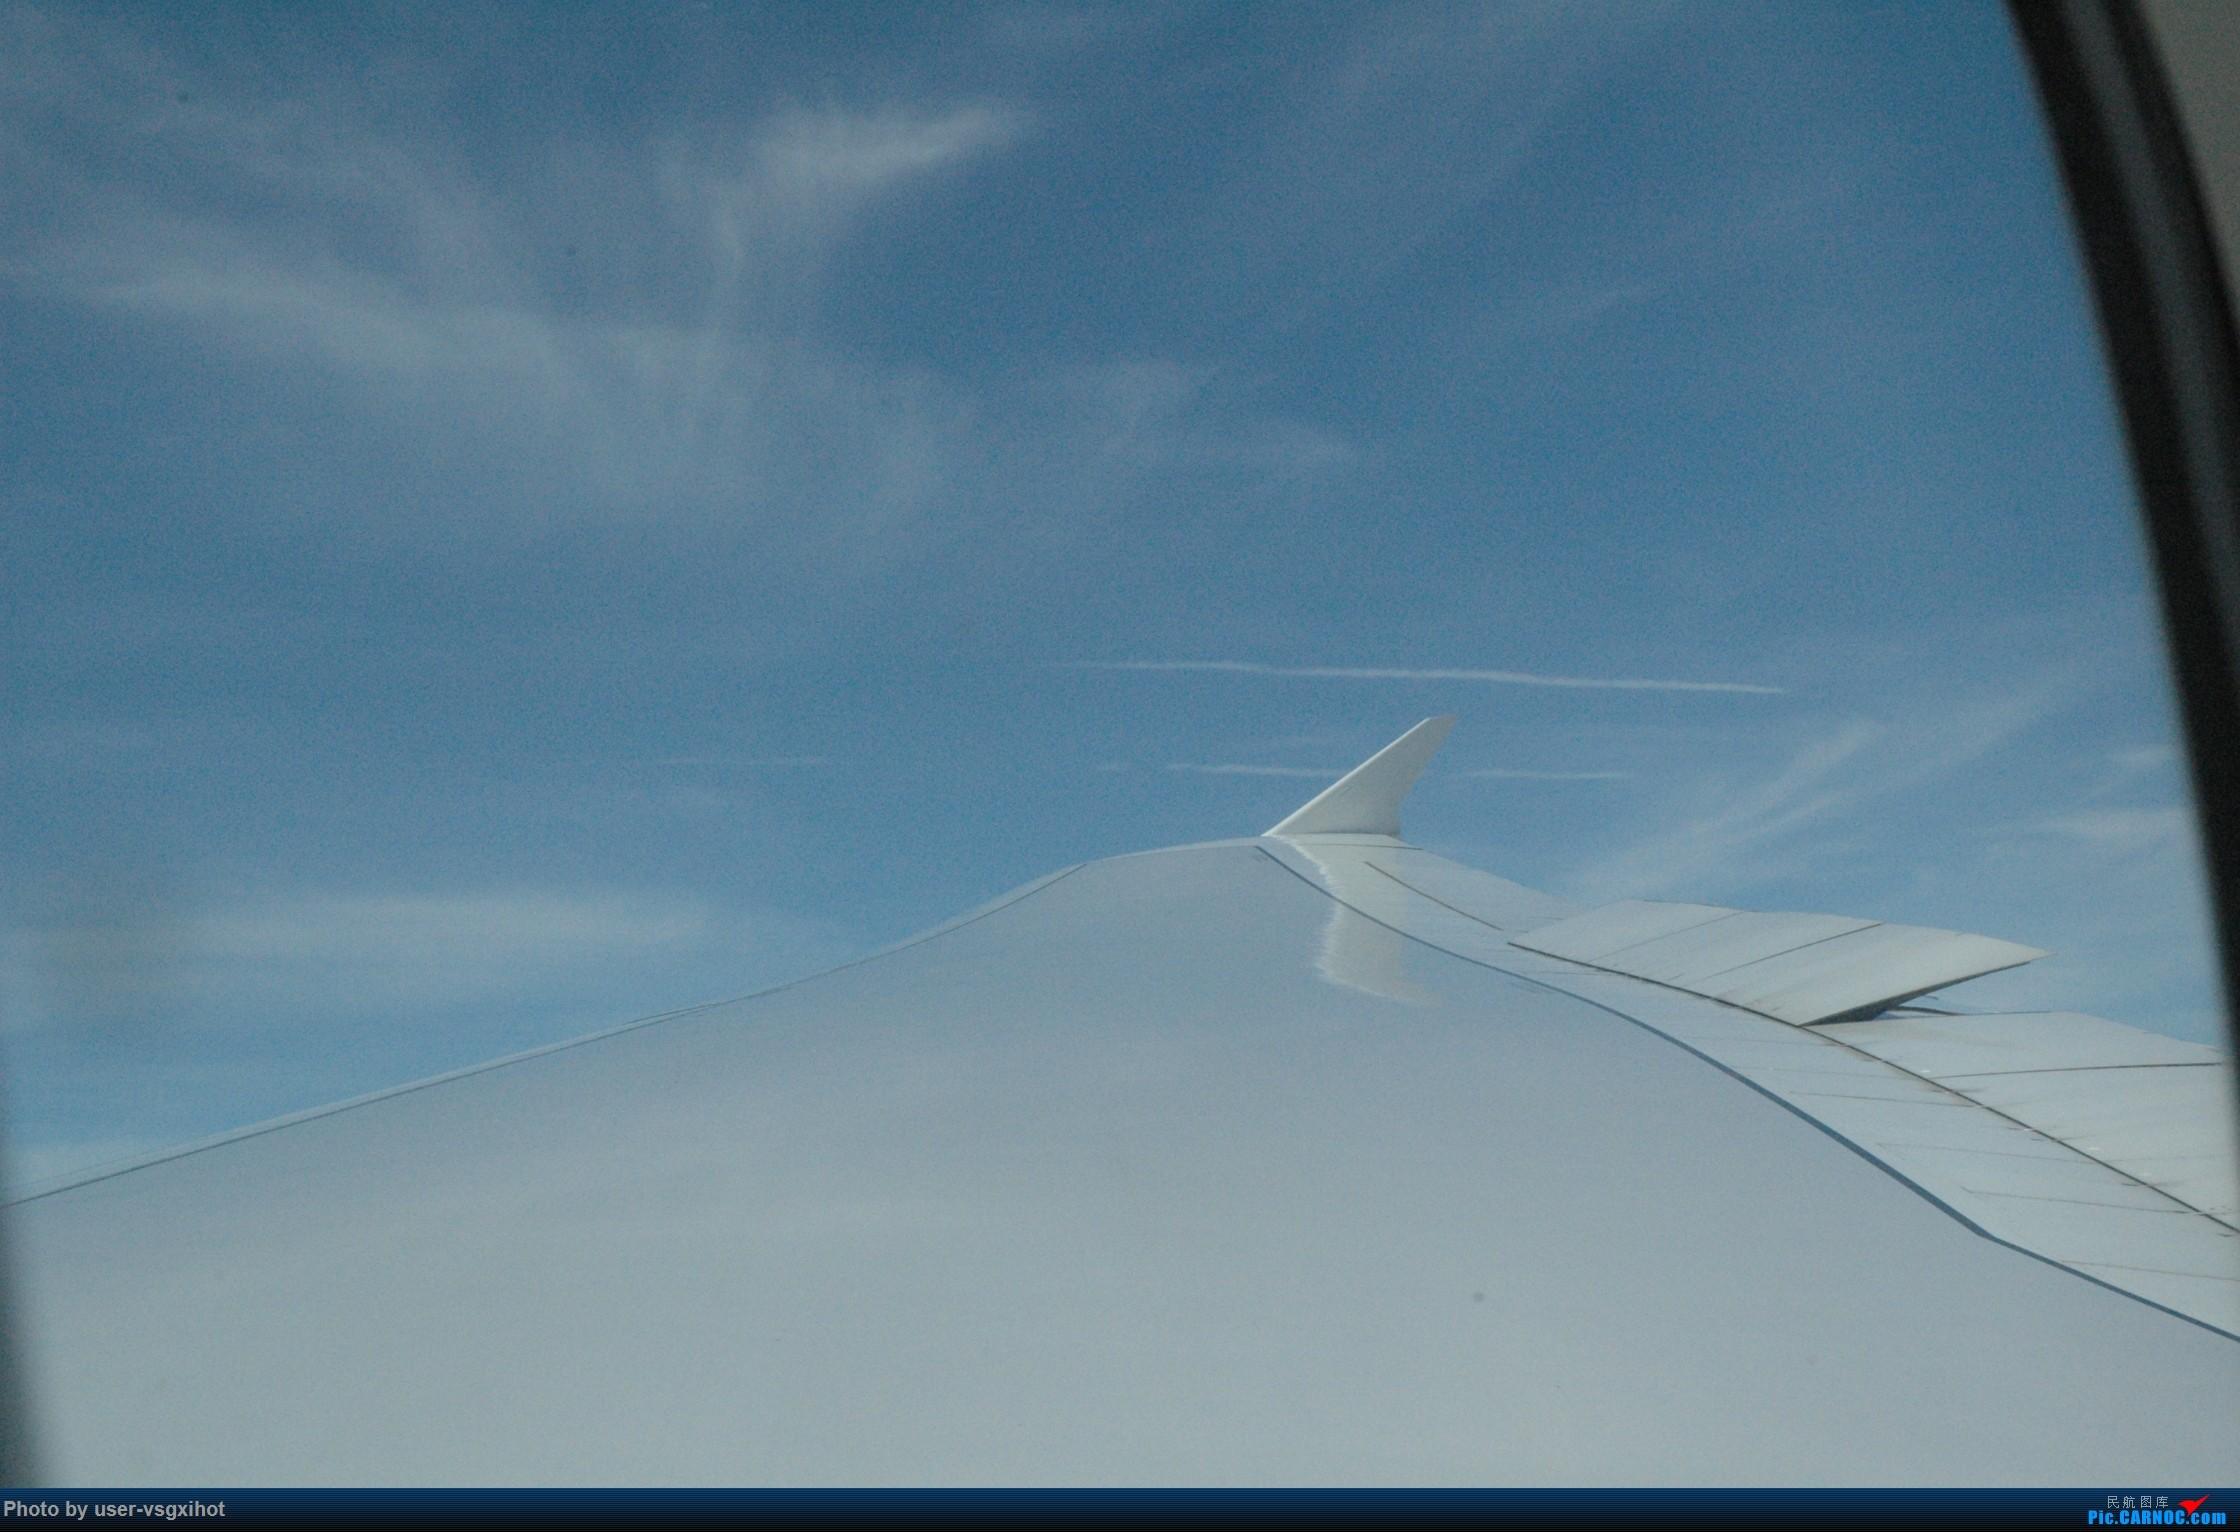 Re:Re:Re:[原创]【Hans游记(6)出埃及记】(PART 1)经阿航转机初识埃及,40度高温下の开罗一日游 AIRBUS A380-800  空中